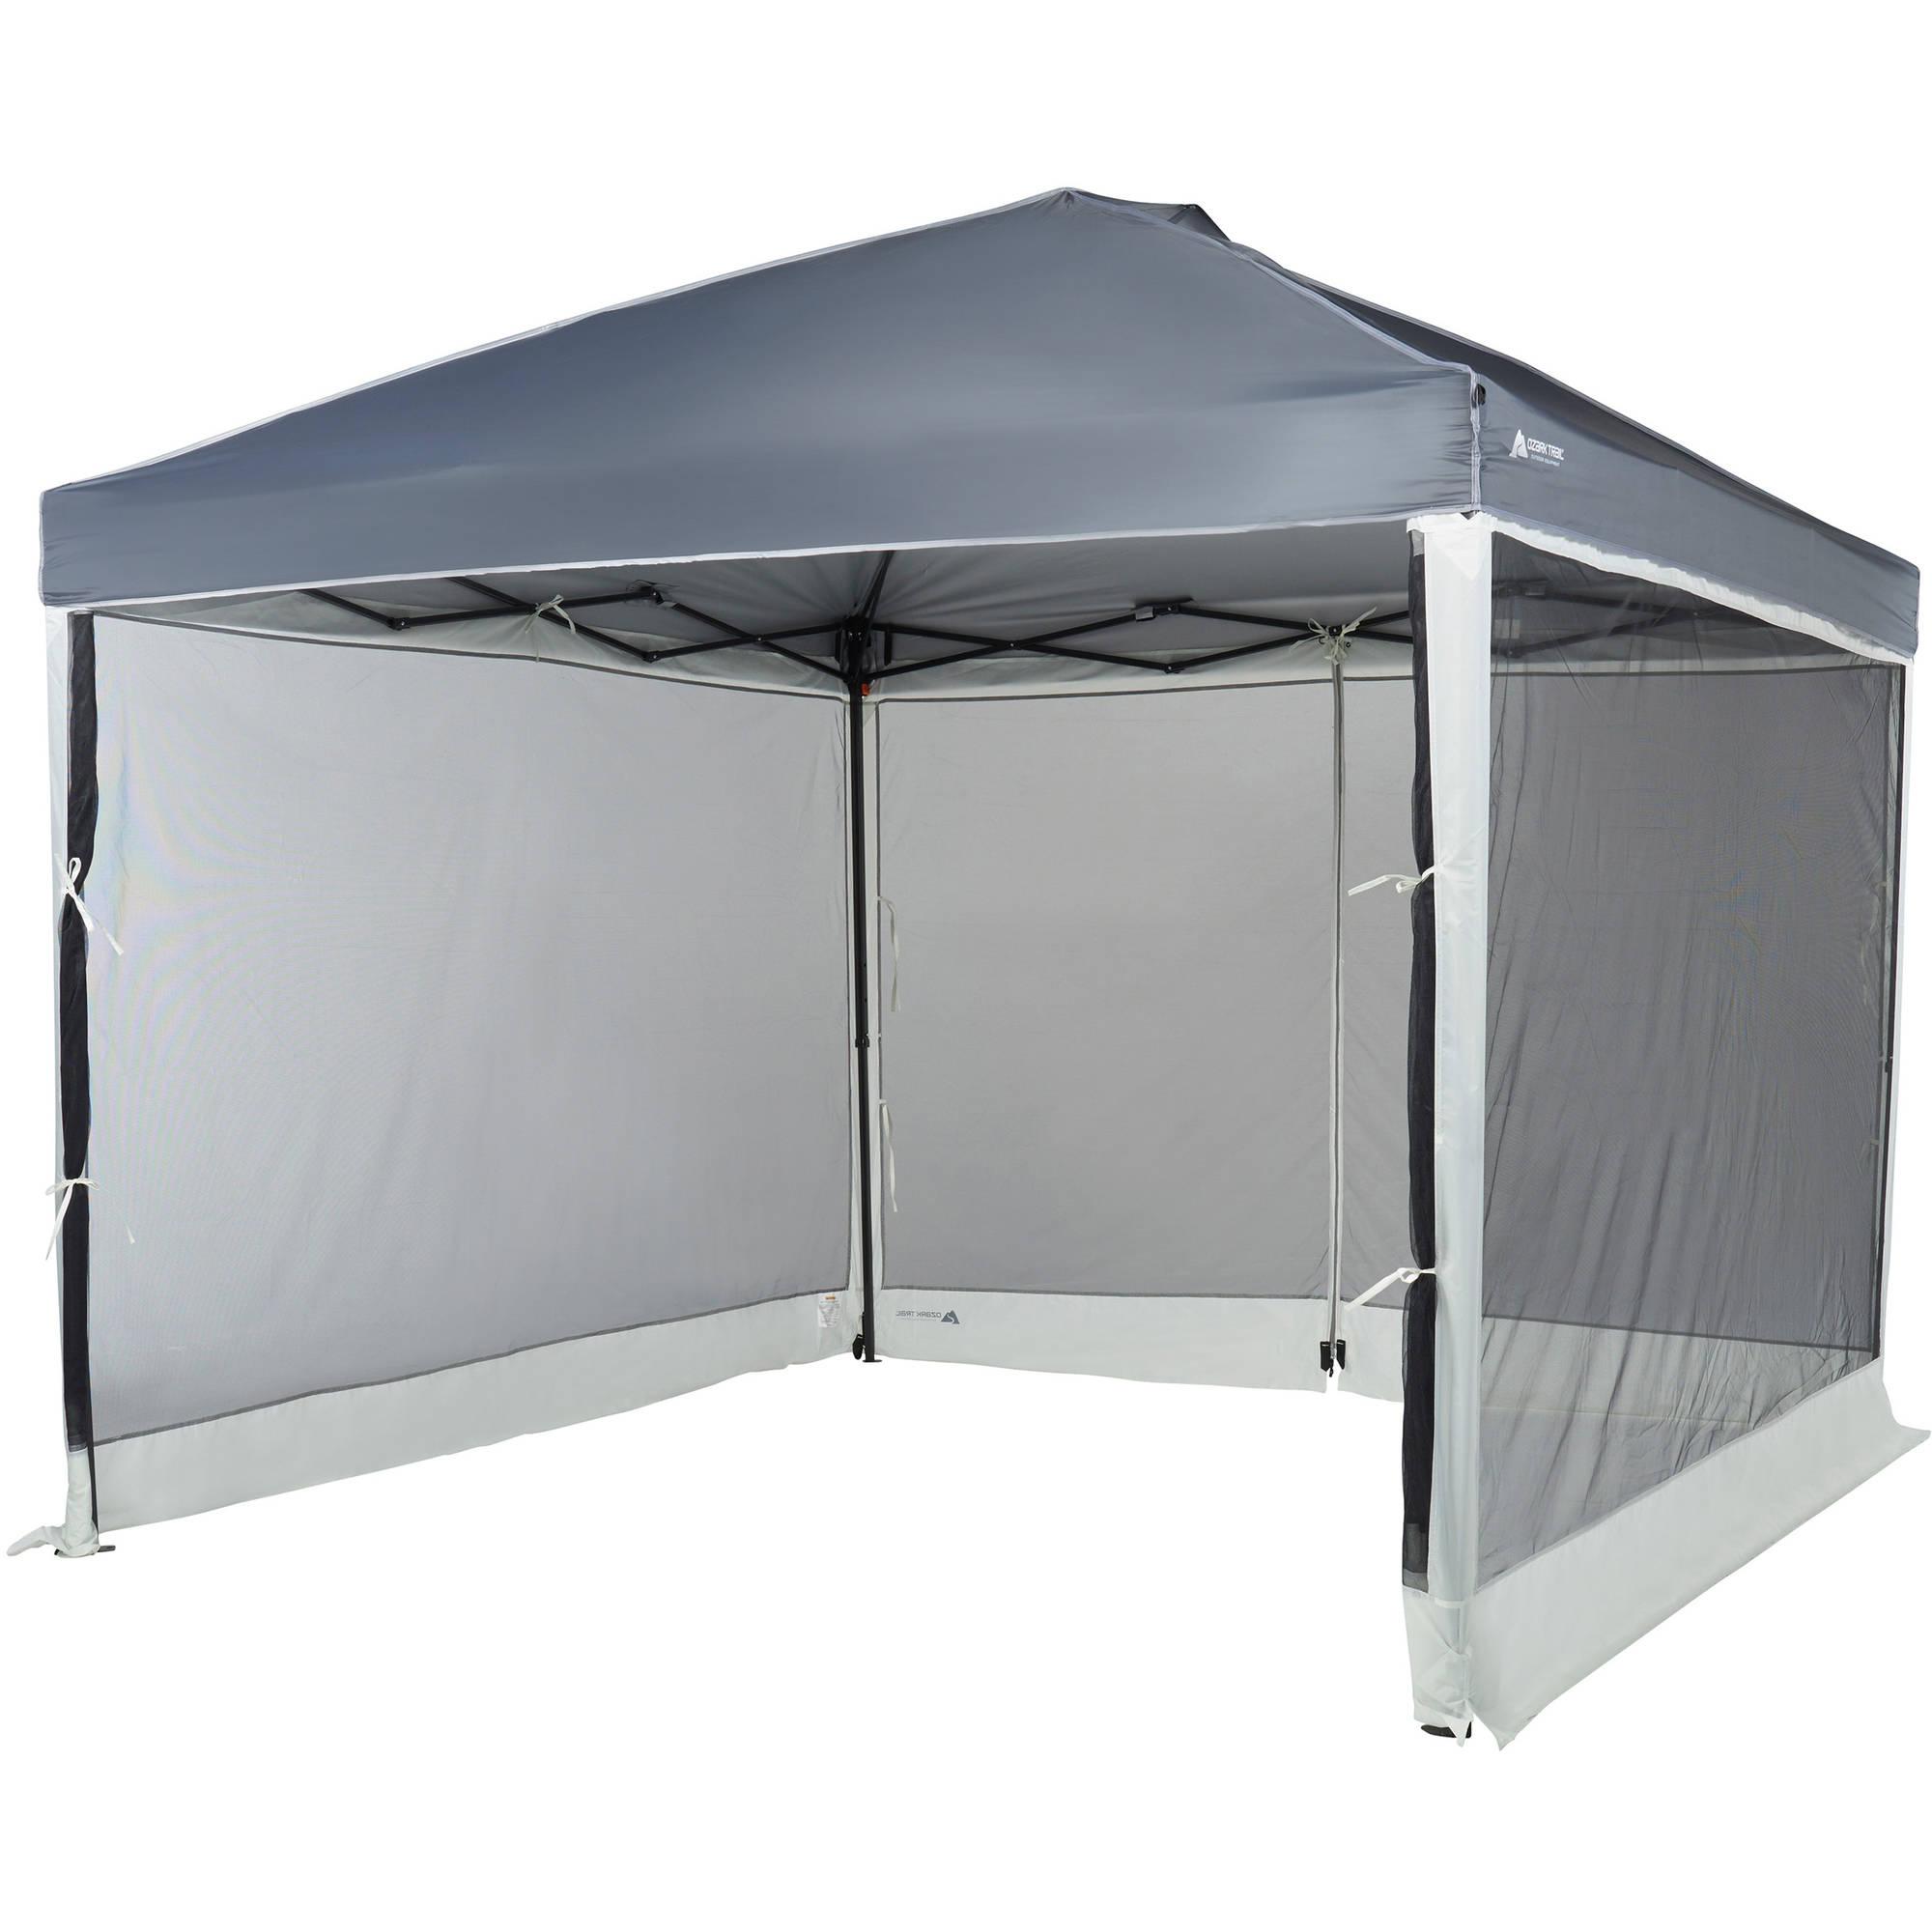 Screen Walls Straight Leg Canopy With 2 Doors Camping Sun